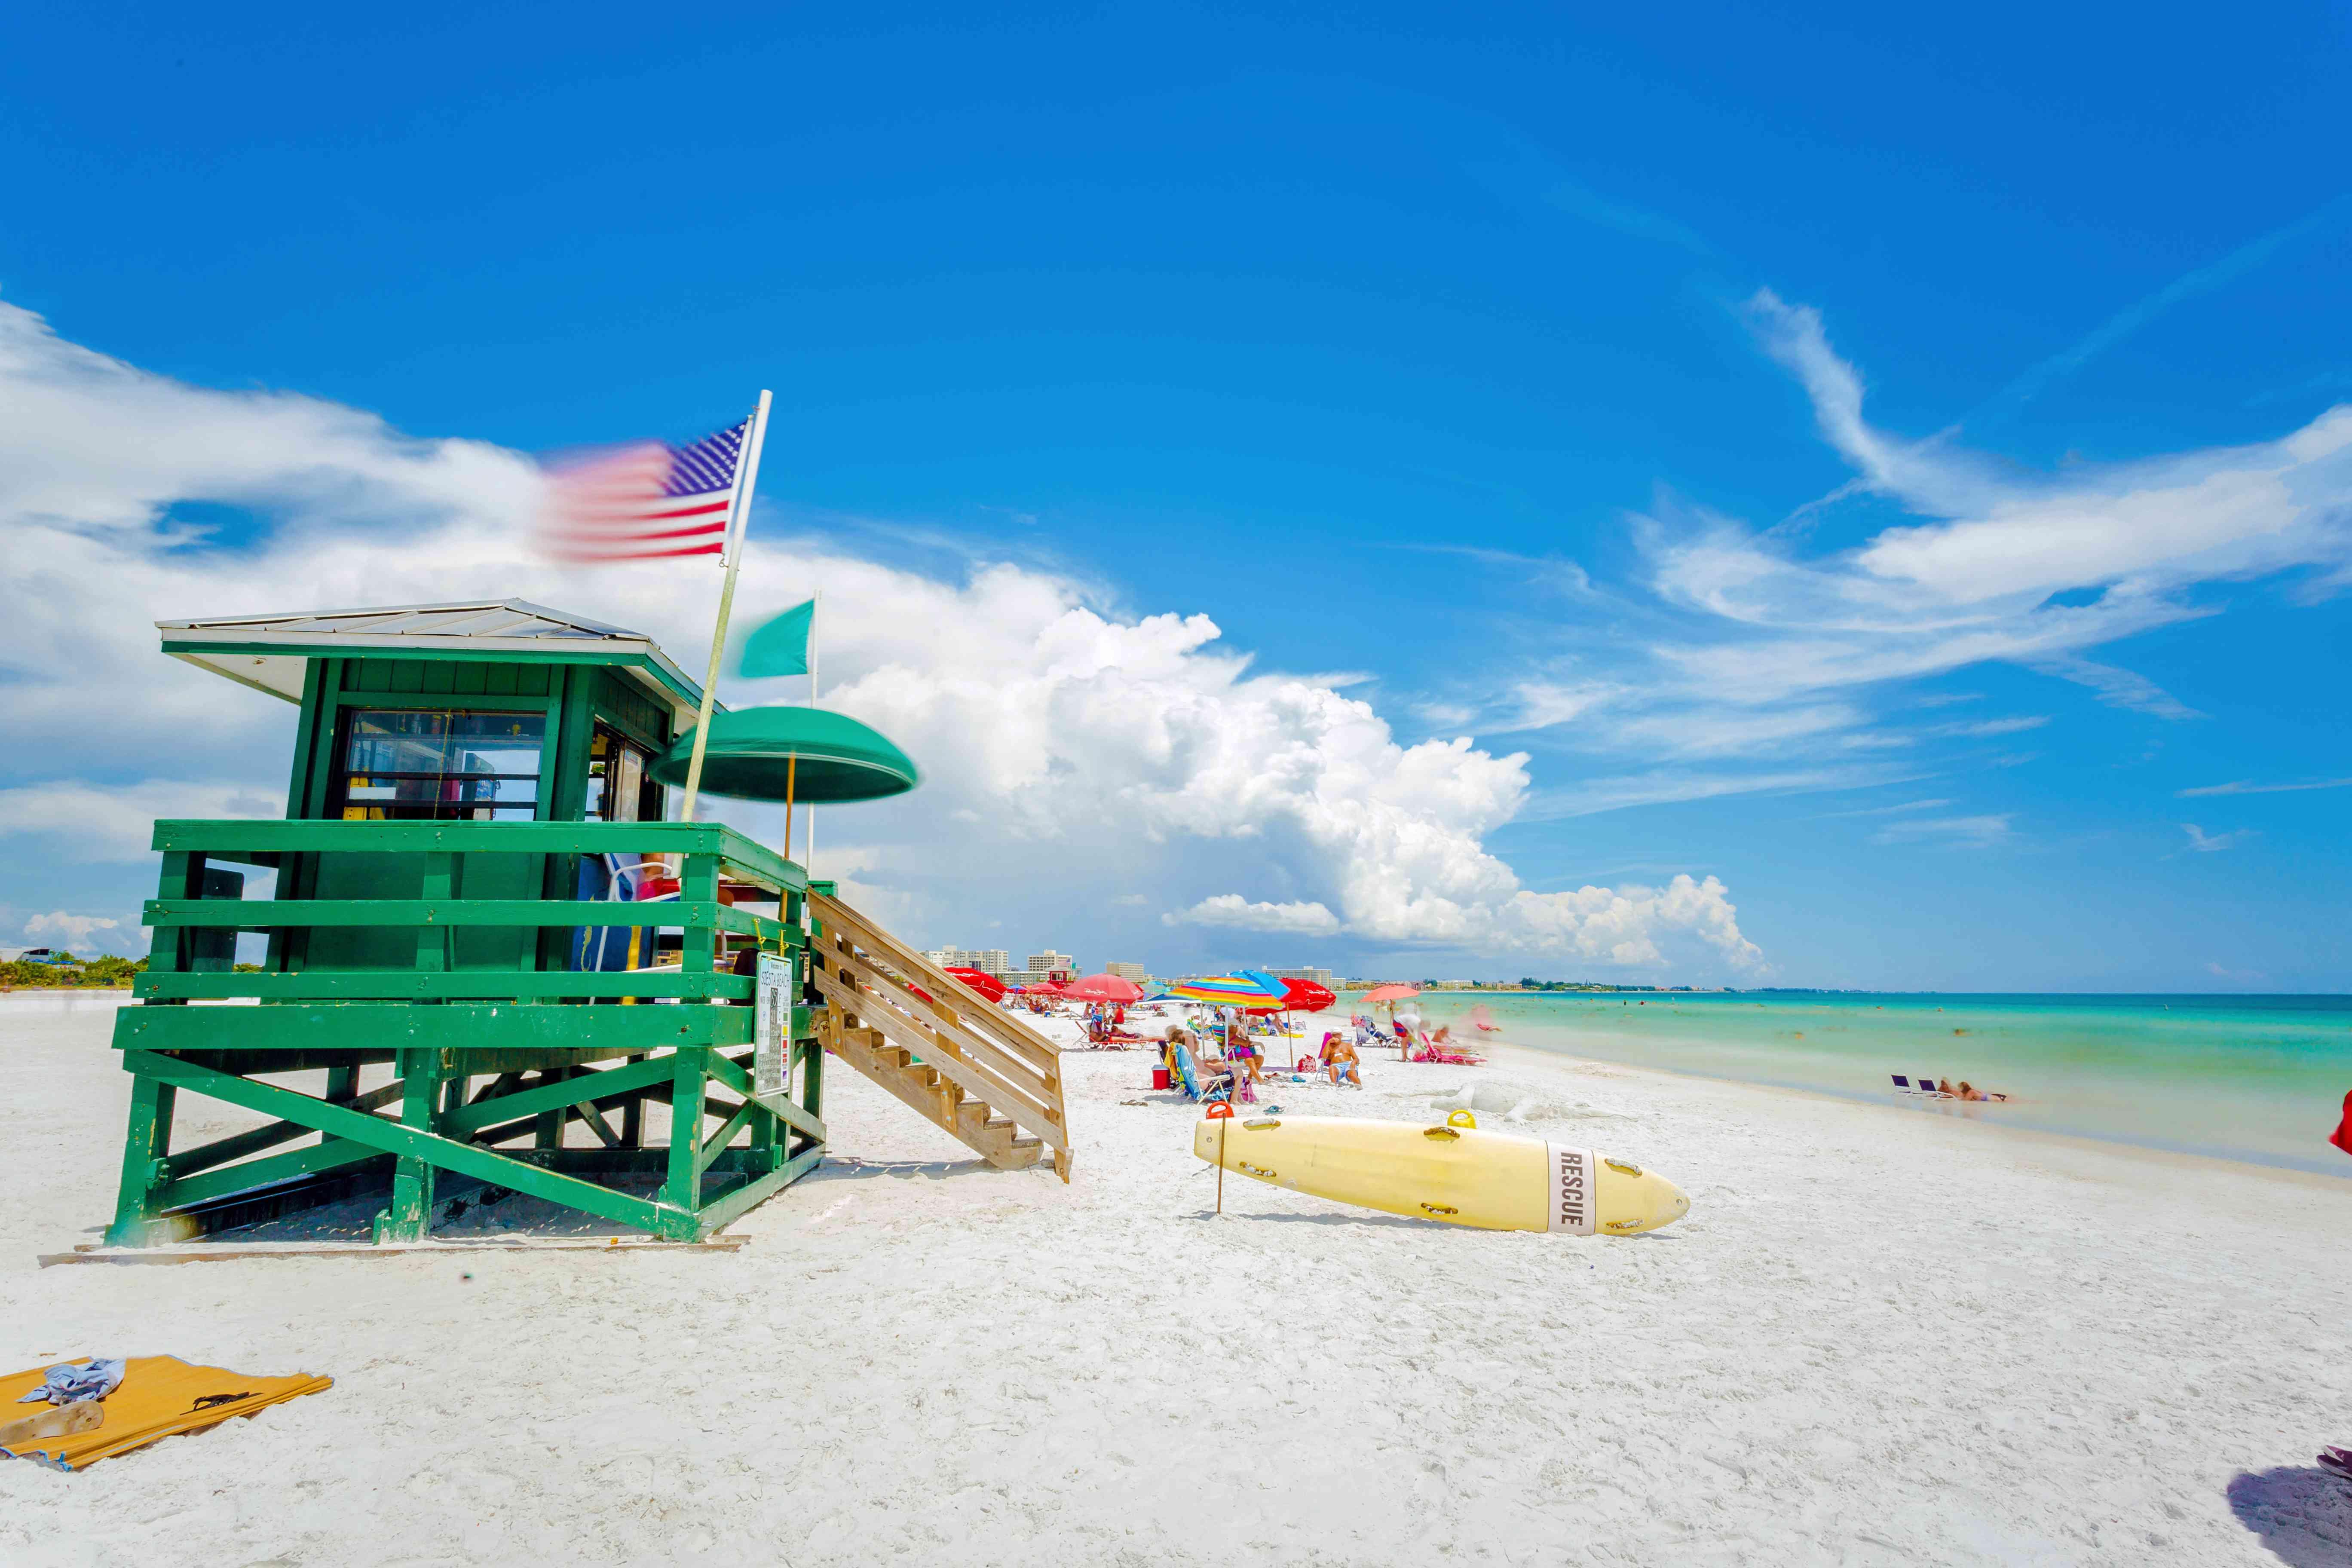 Siesta Key Beach en Sarasota, Florida, EE. UU.